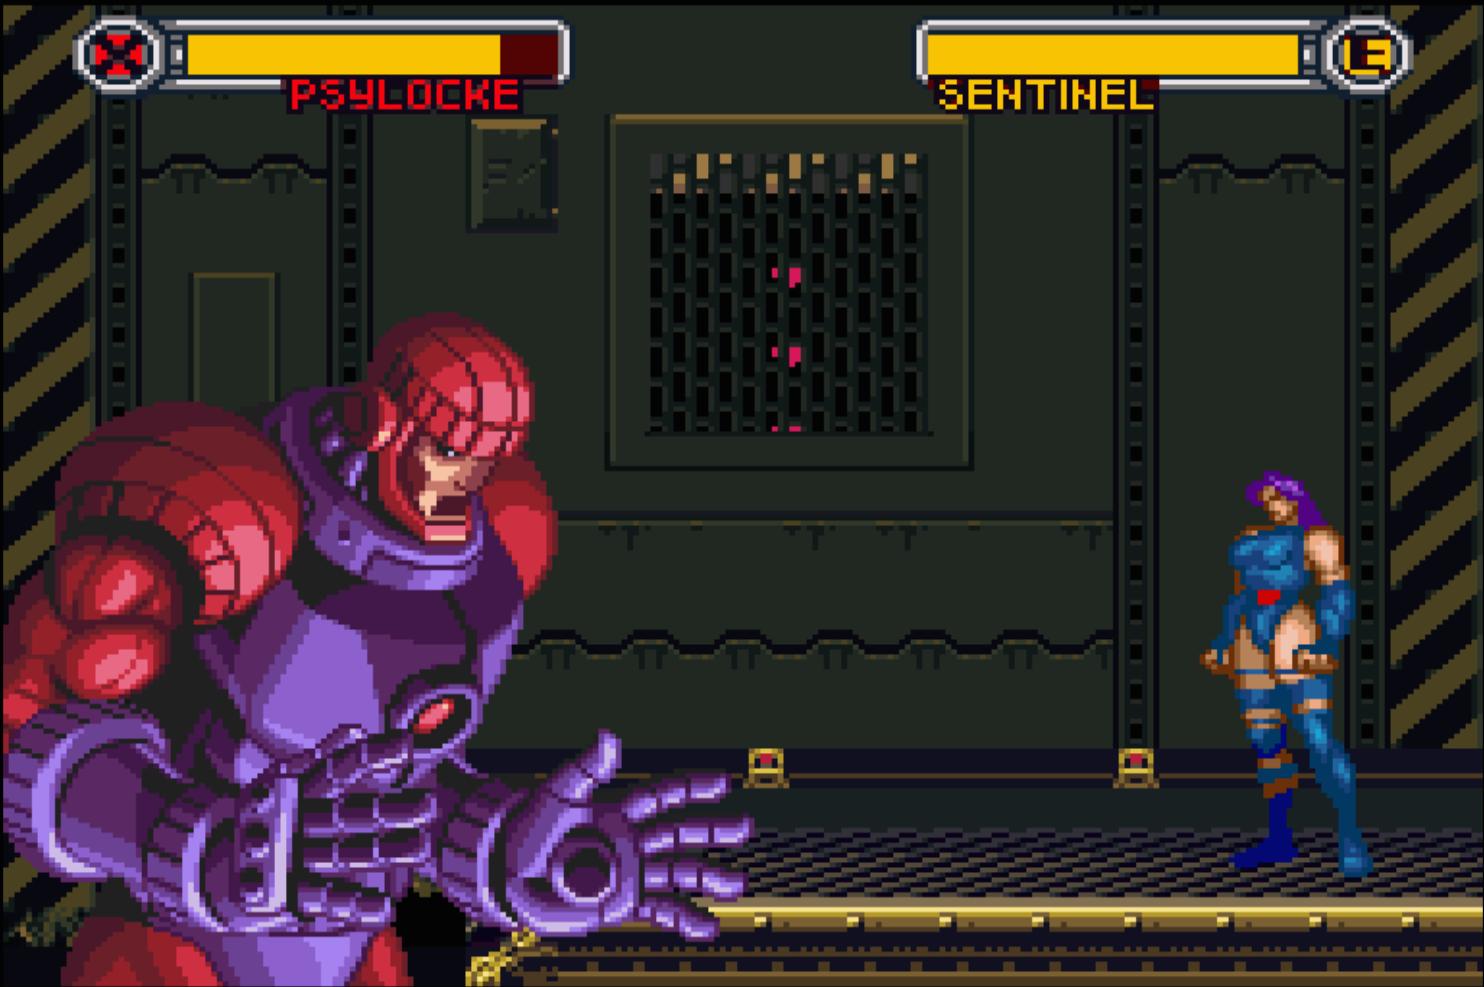 Psylocke and Sentinel